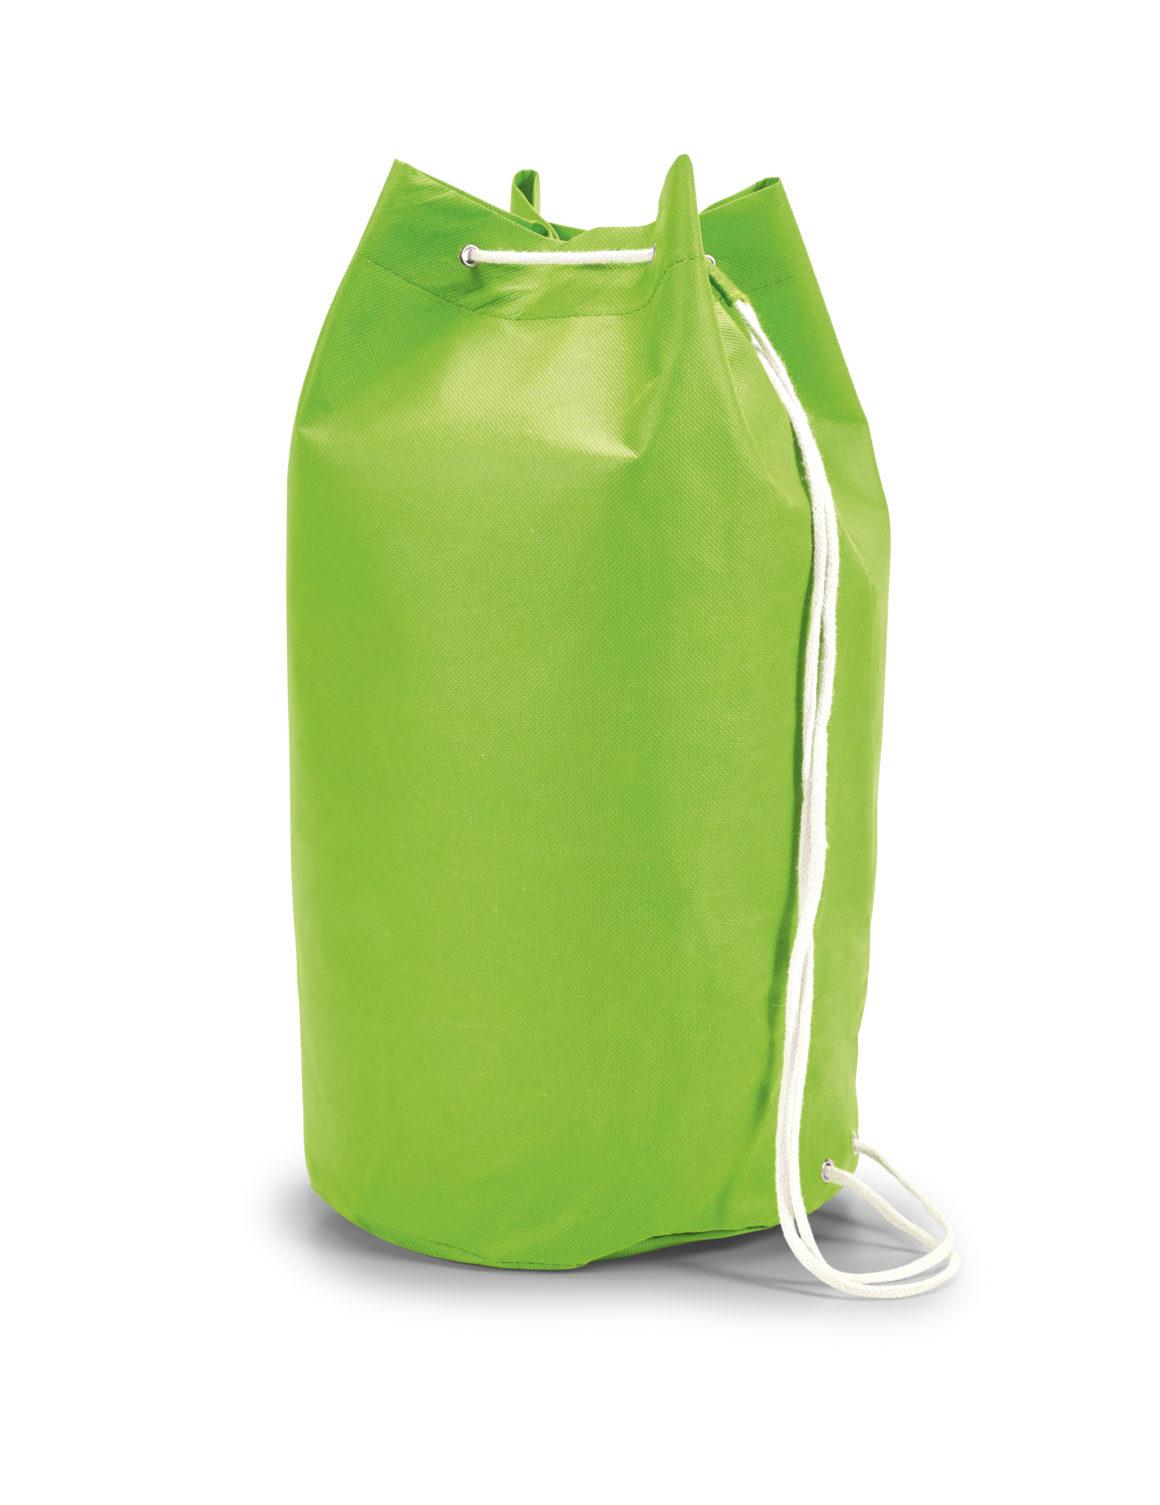 Charlestown Eco-friendly Sailor Bag  Product Code GP92504